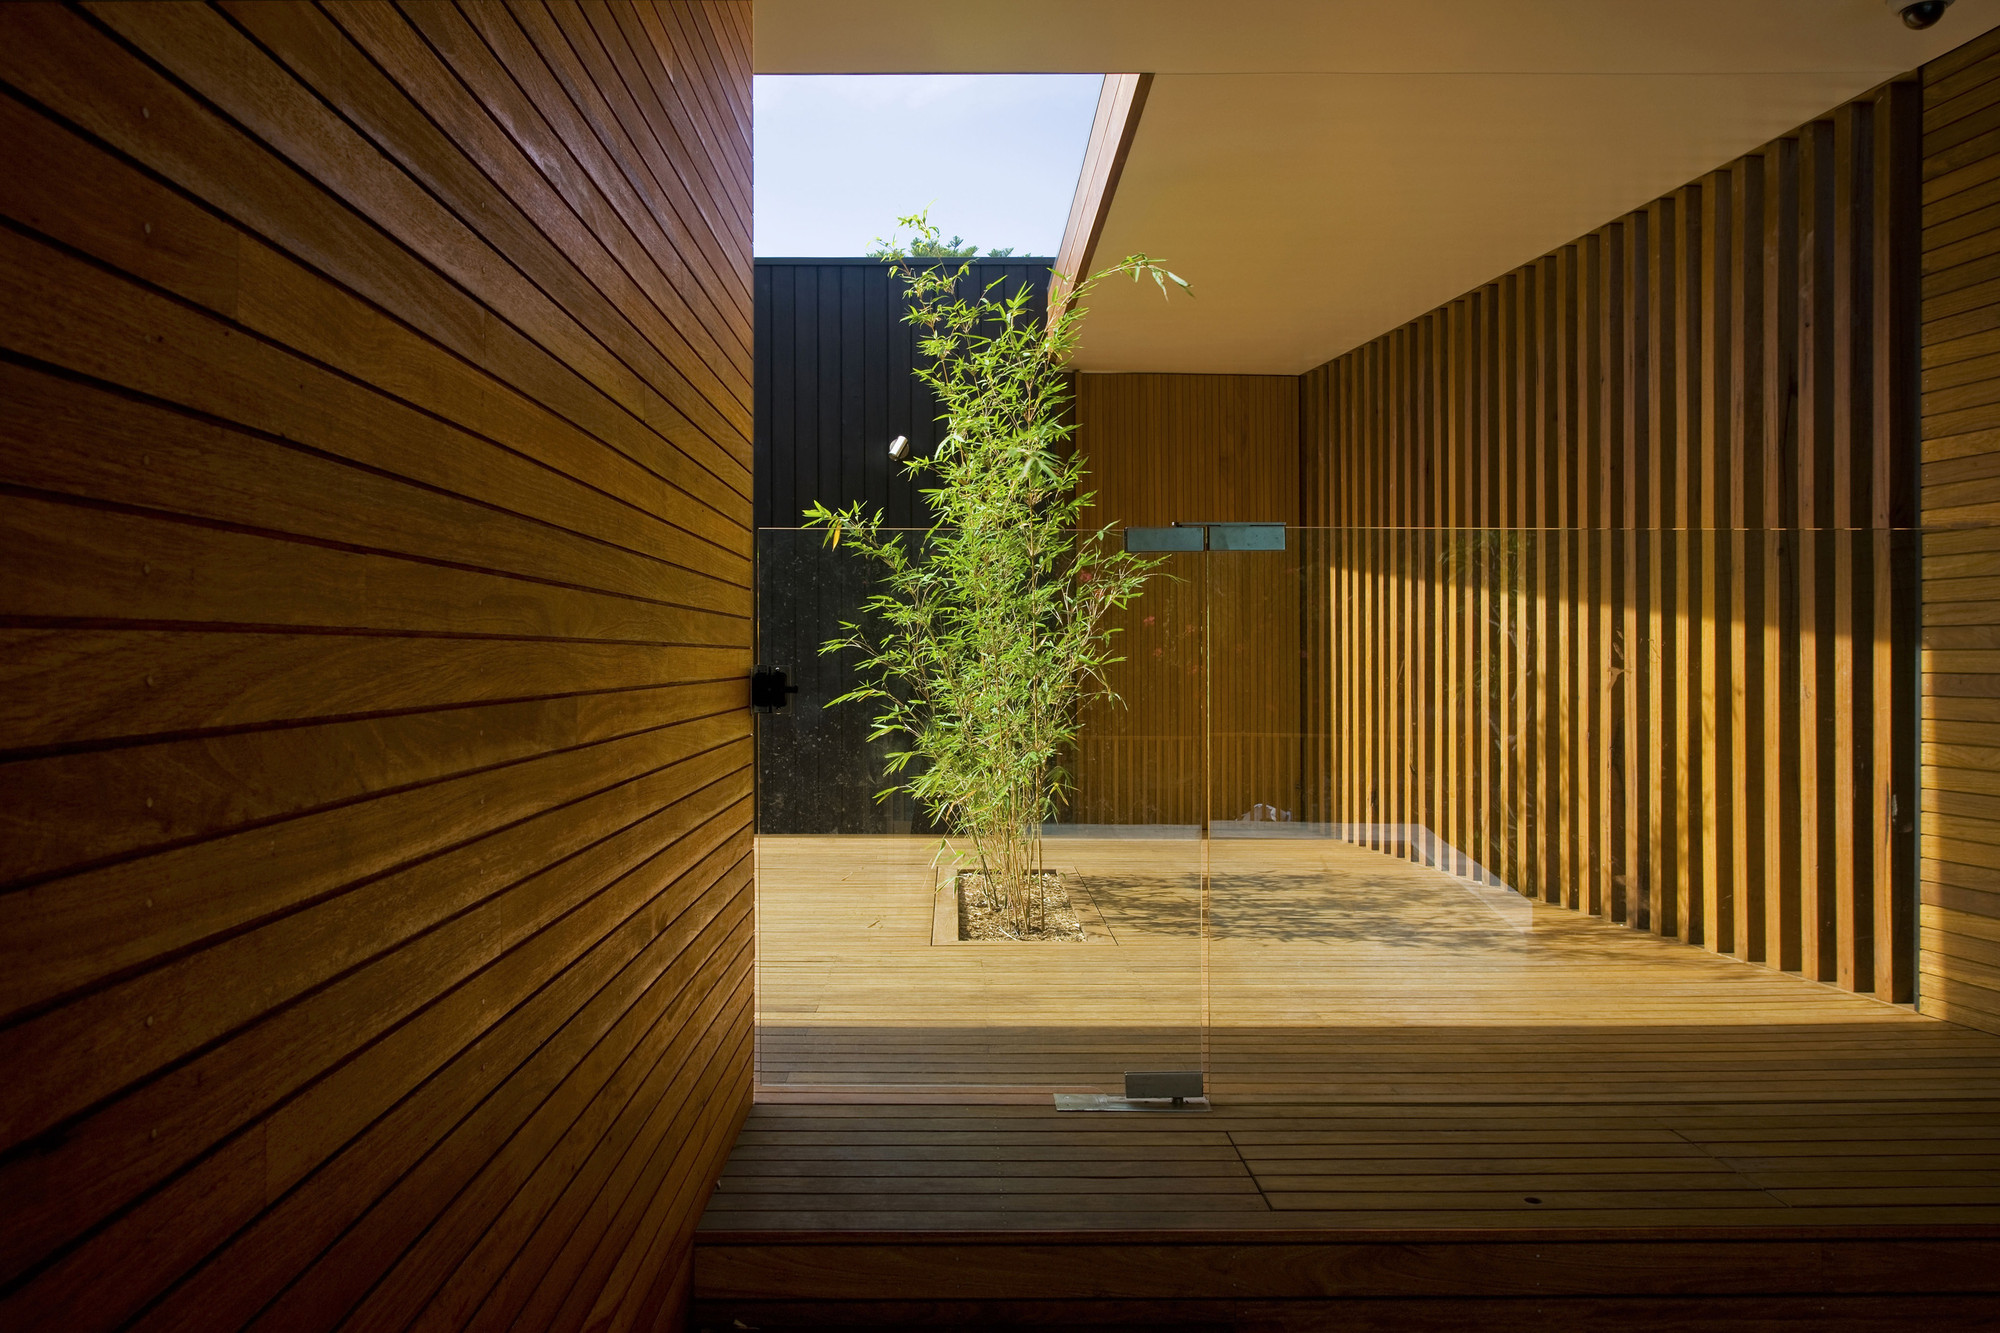 gallery of narrabeen house chrofi 4. Black Bedroom Furniture Sets. Home Design Ideas